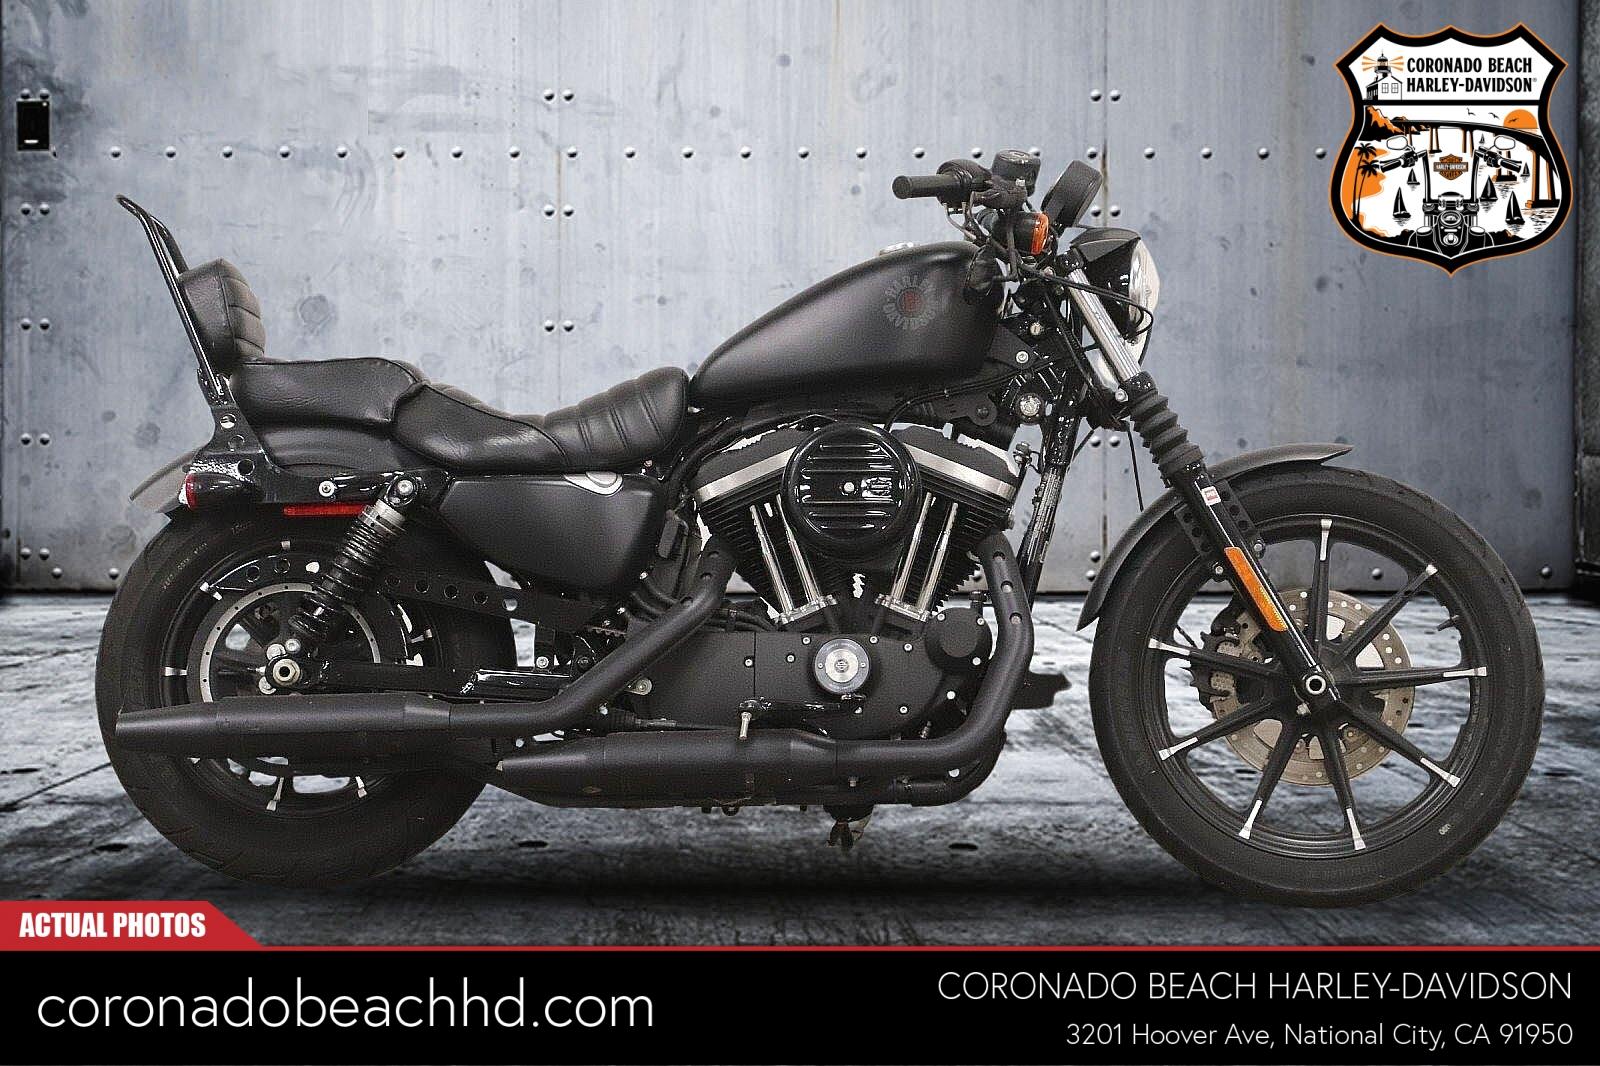 2019 Harley-Davidson Sportster 883 Iron [96]